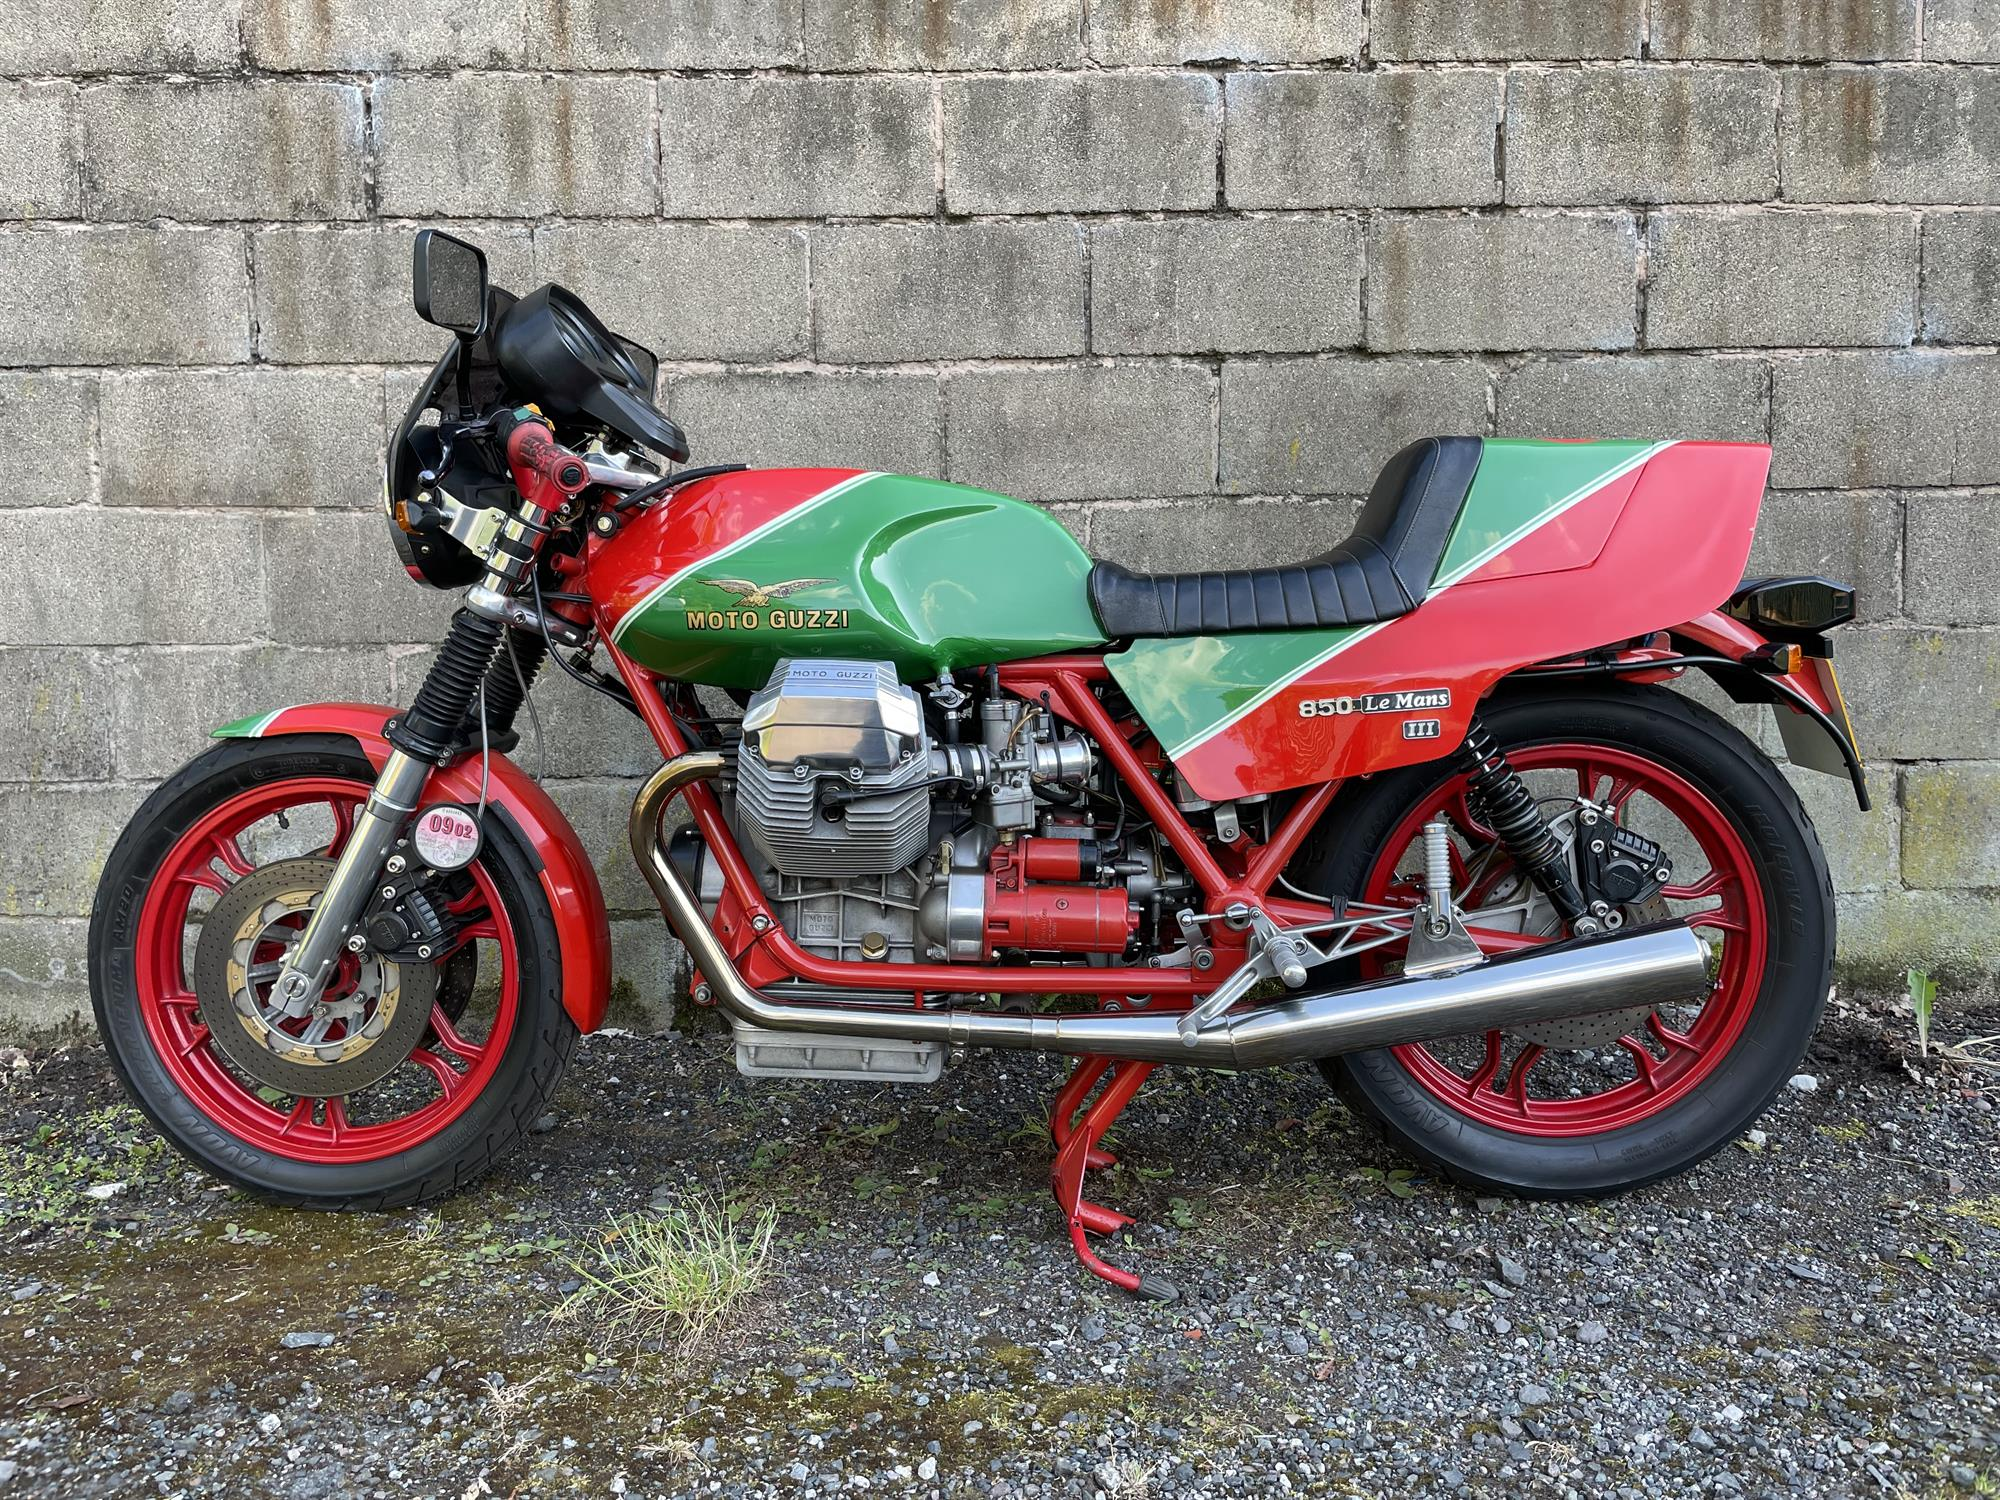 1983 Moto Guzzi 850 Le Mans III - Image 6 of 10